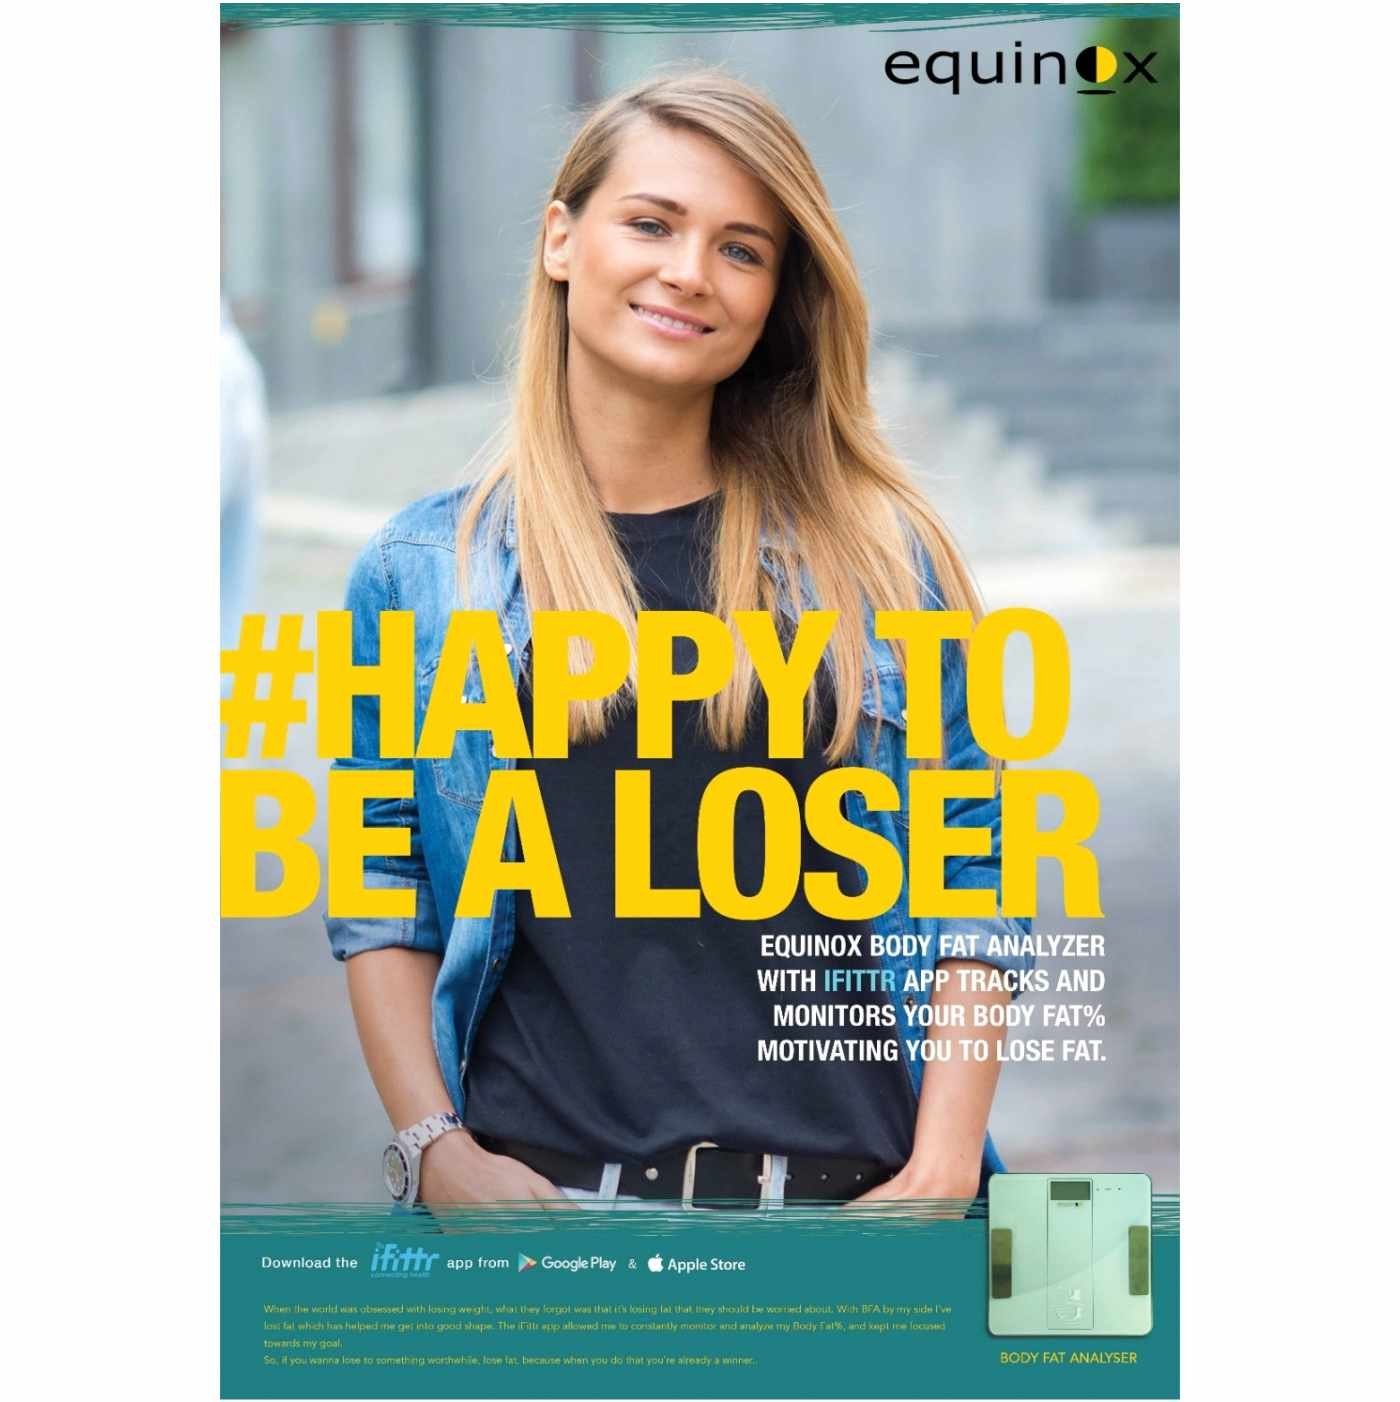 Equinox_6